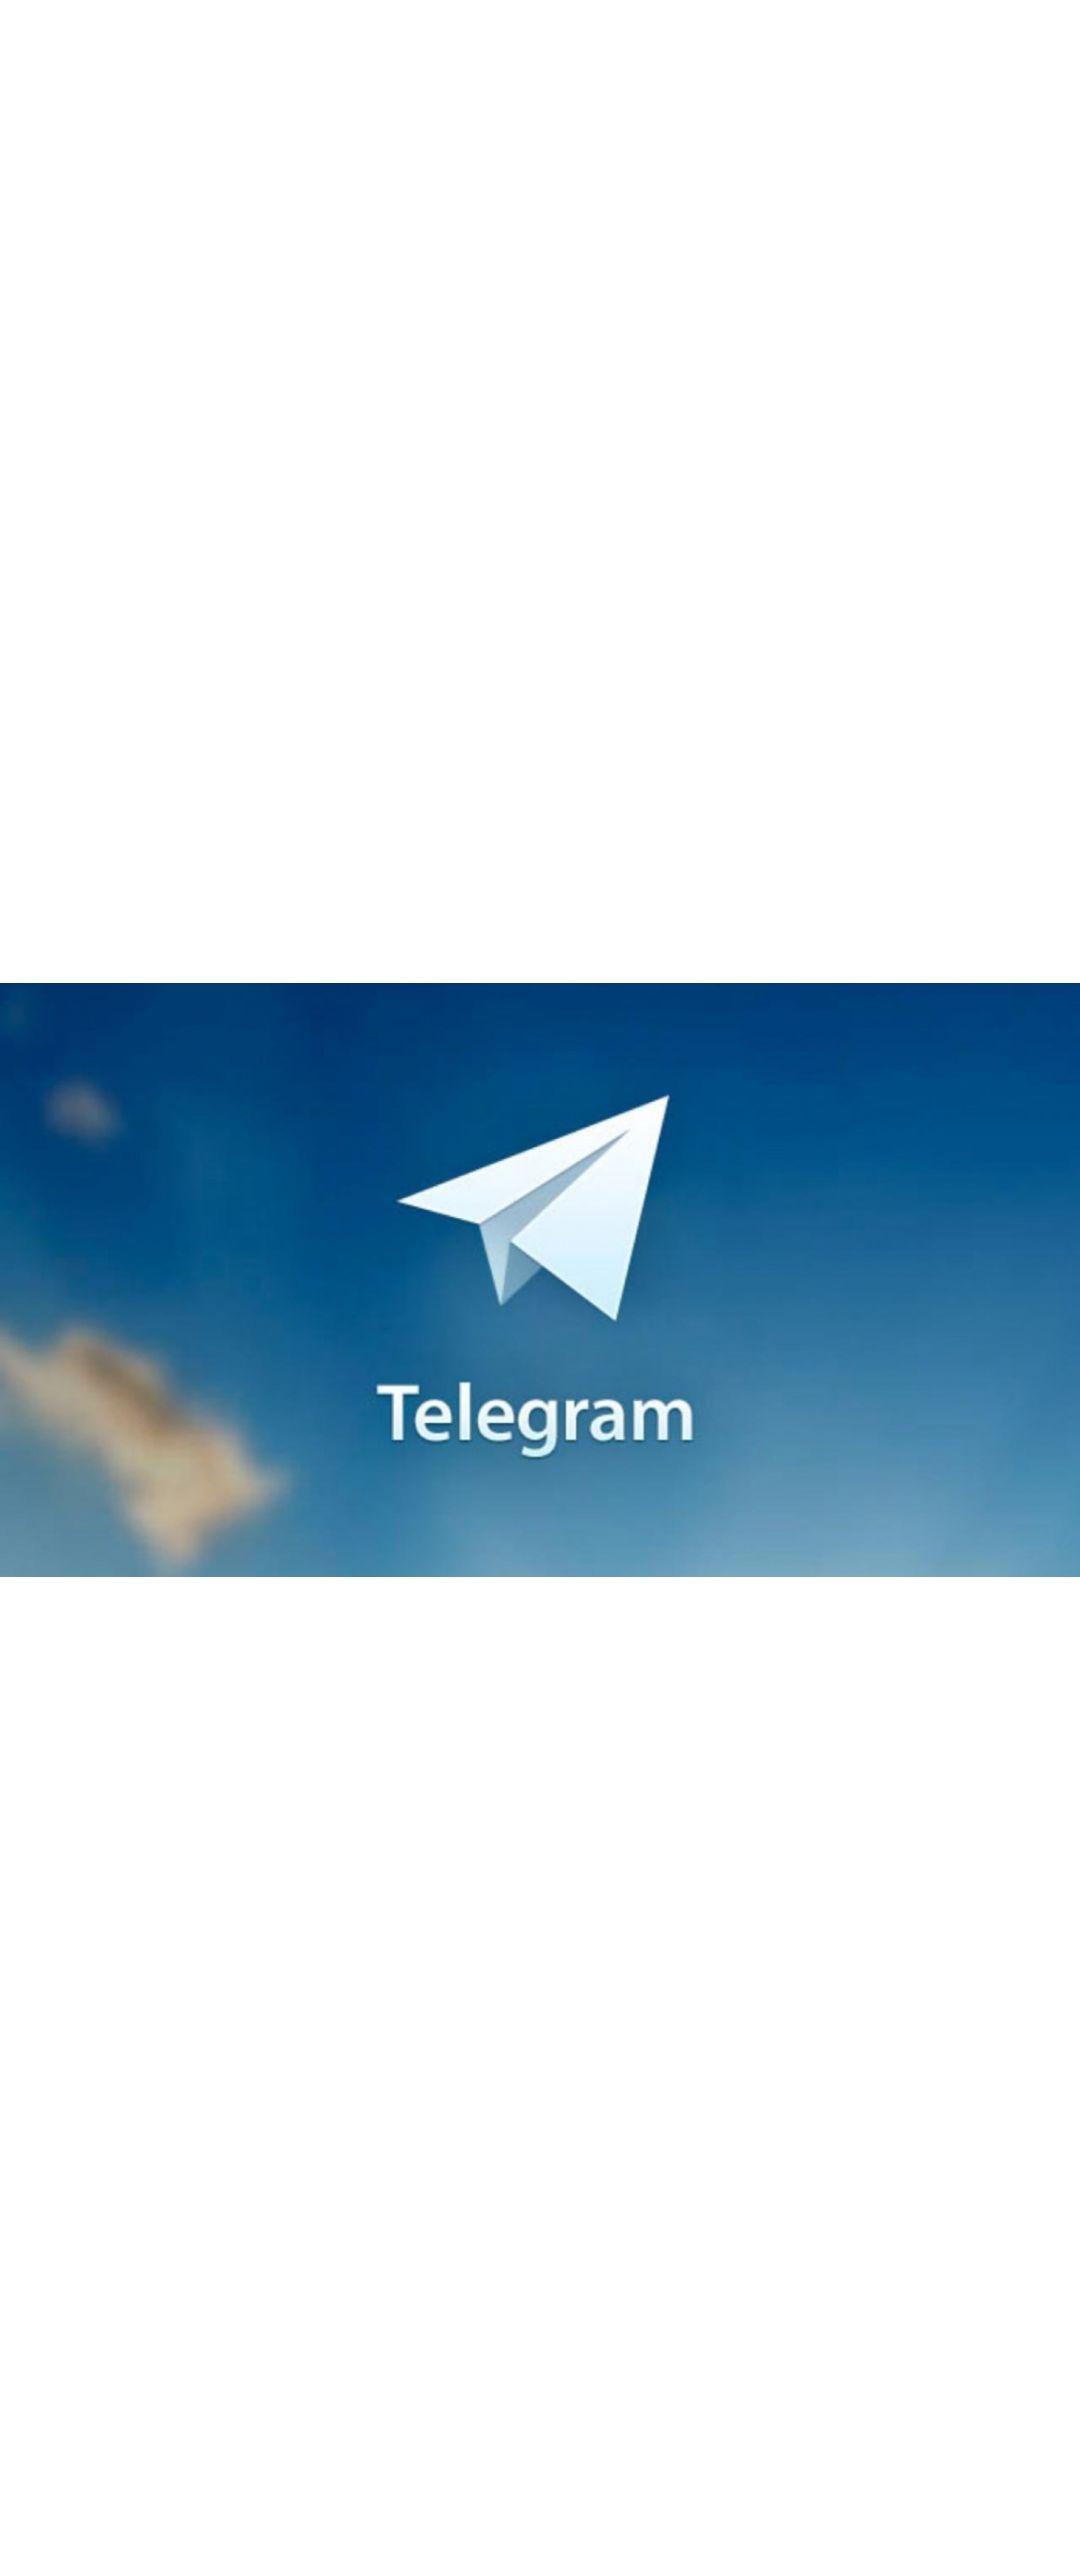 Telegram te vuelve m�s creativo en su �ltima actualizaci�n